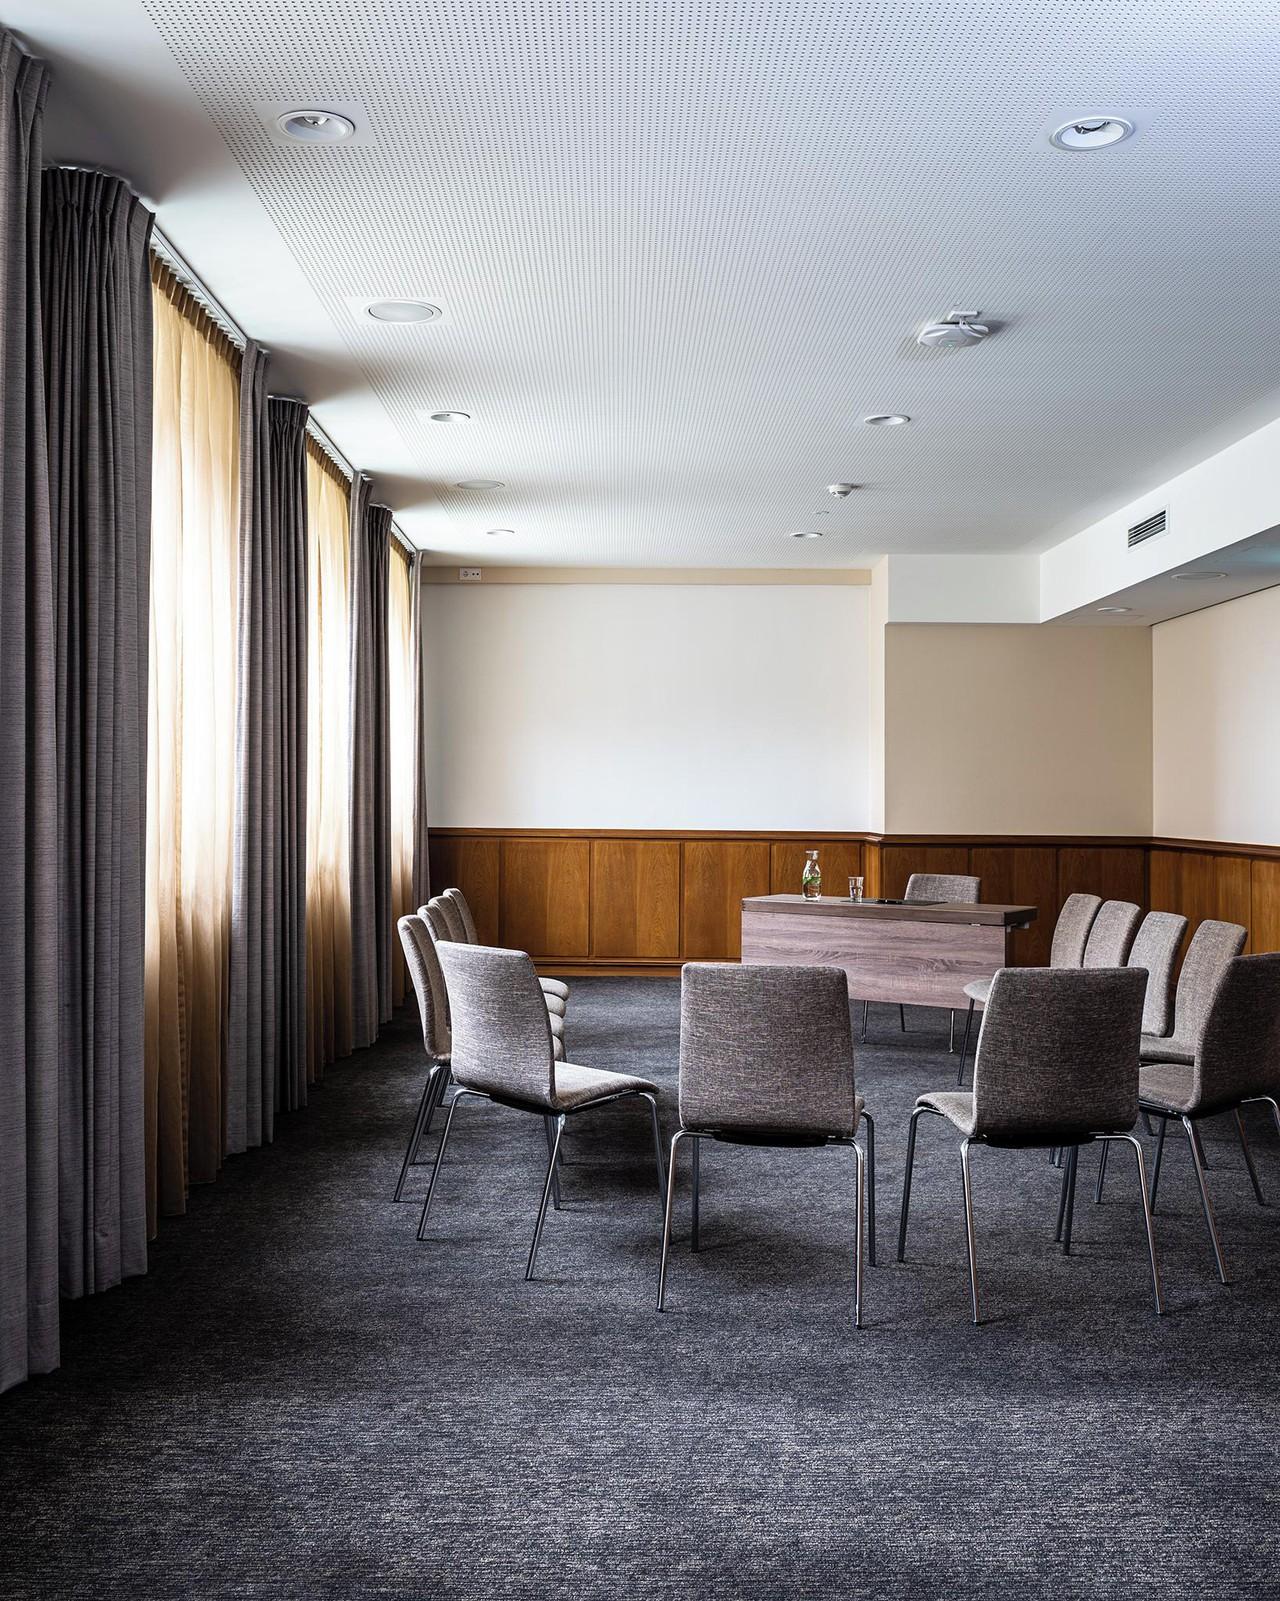 Hamburg Schulungsräume Meeting room New York I image 0